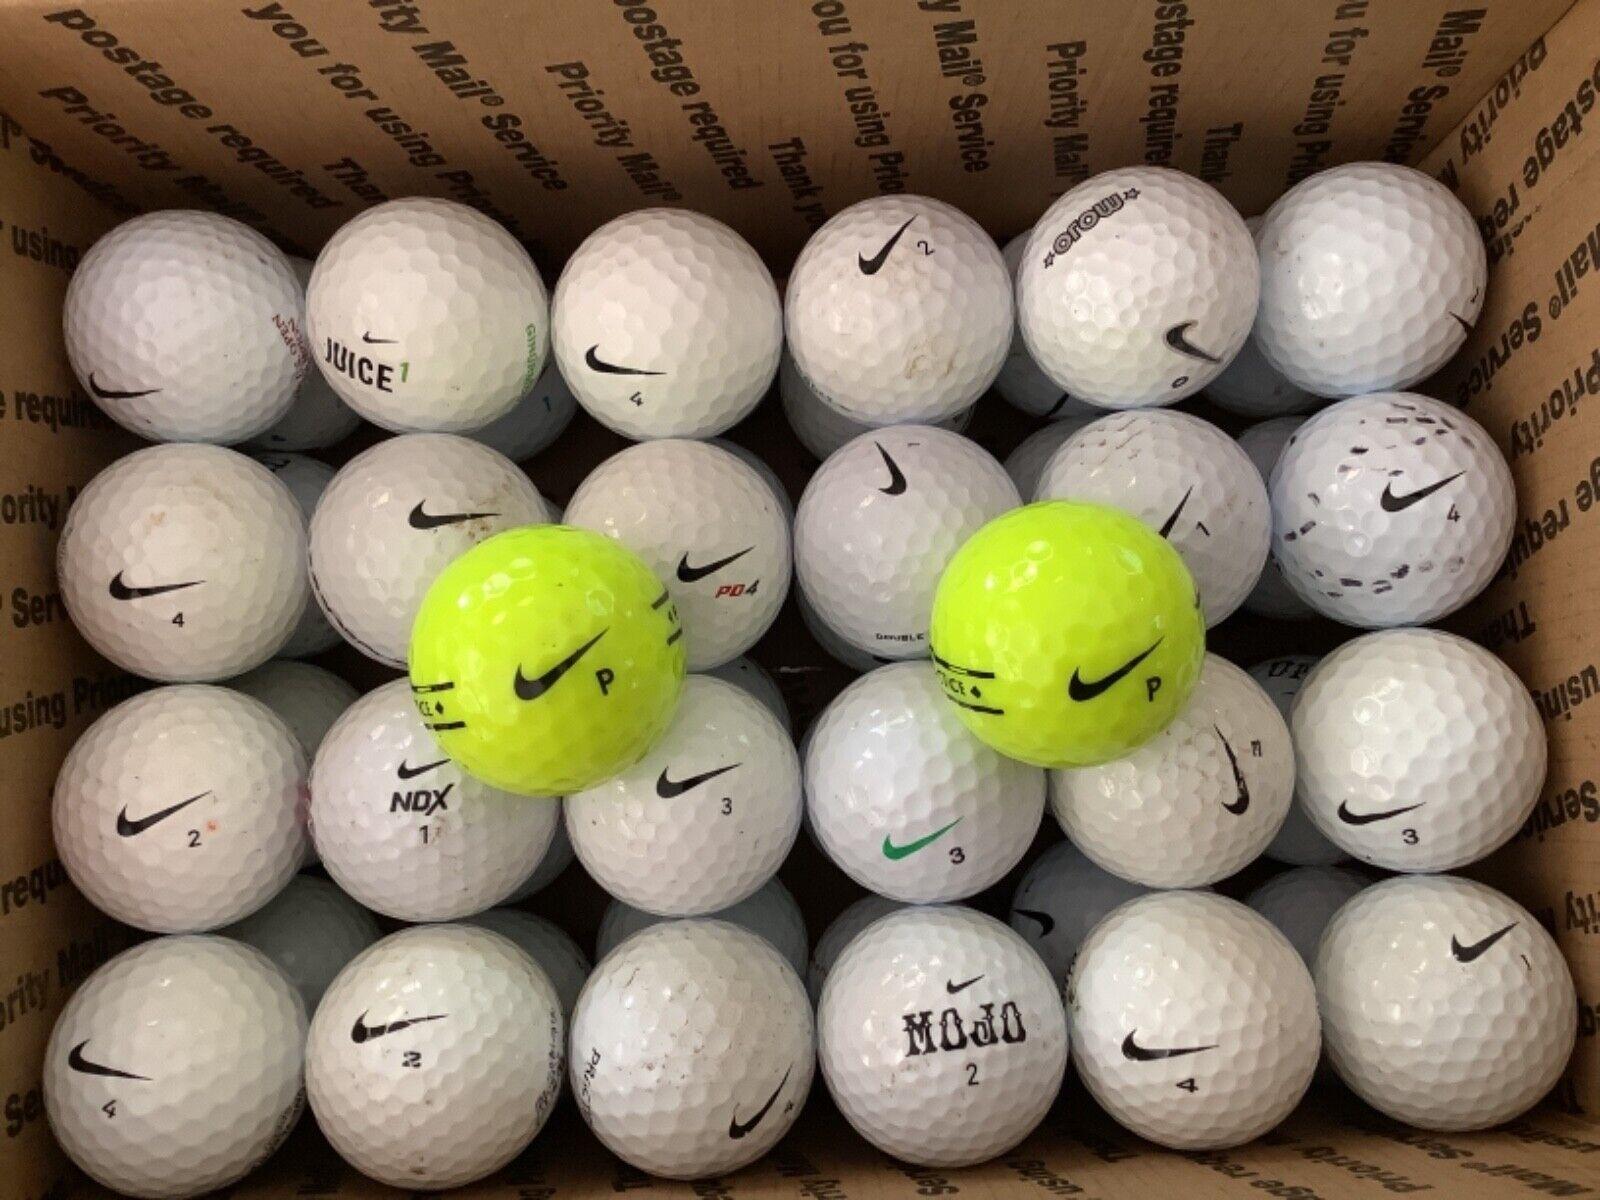 50 assorted balls